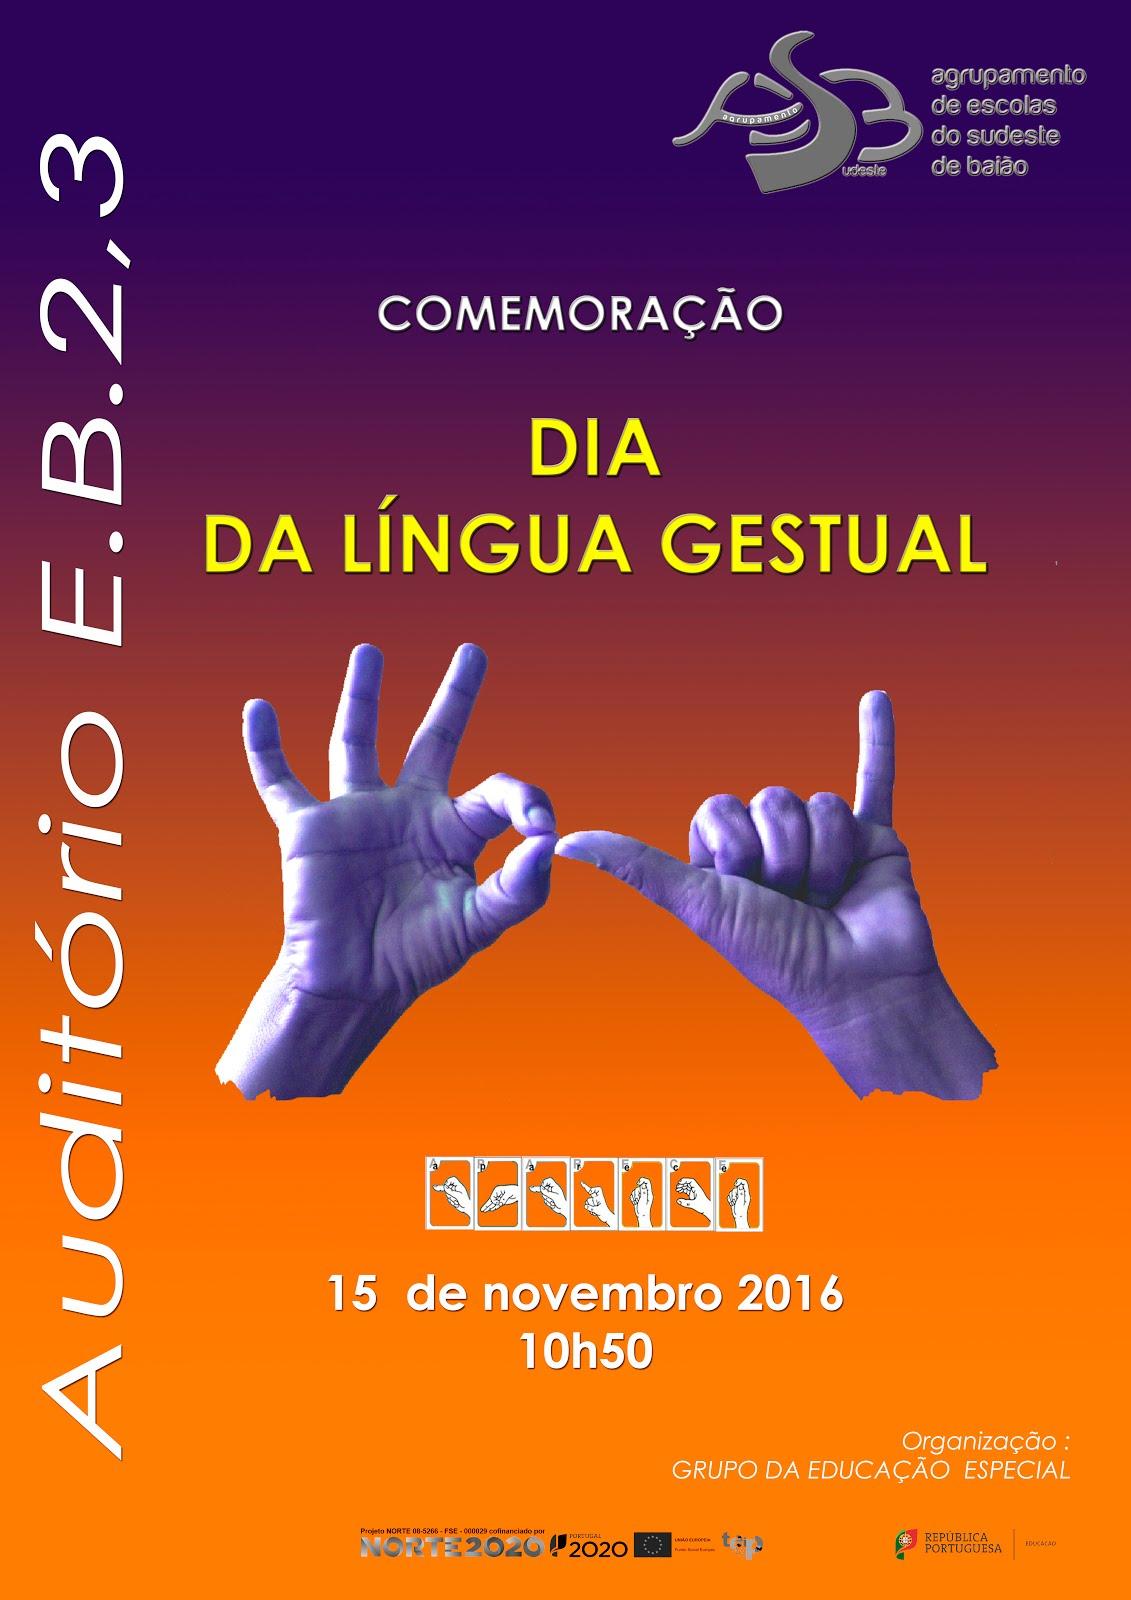 Dia da Língua Gestual - 15/11/2016